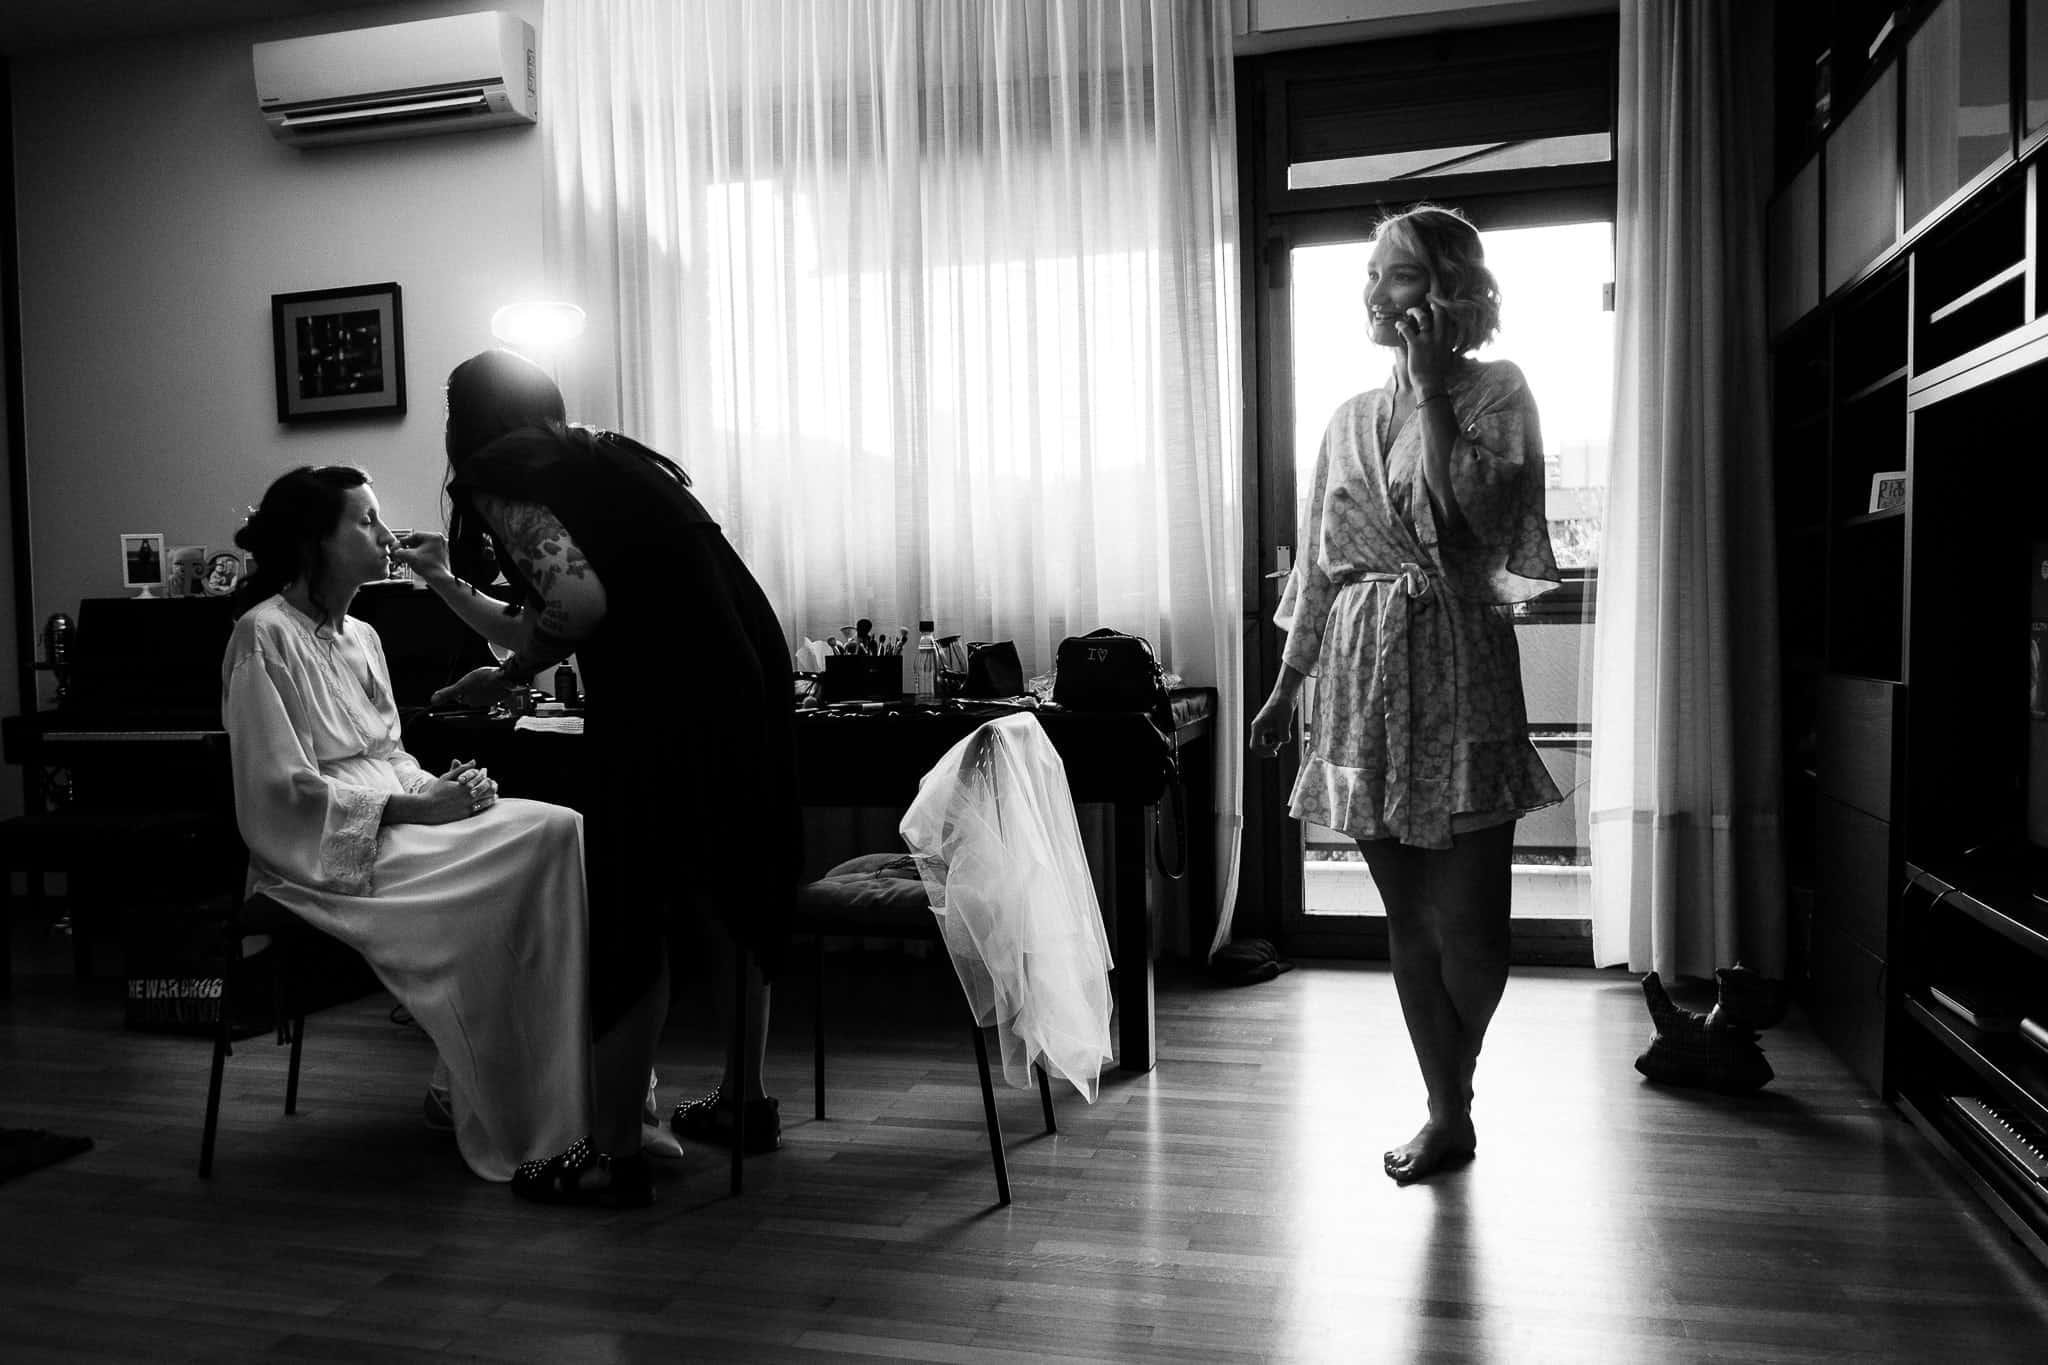 matrimonio Canter Milano San siro Luca rossi wedding reportage 0009